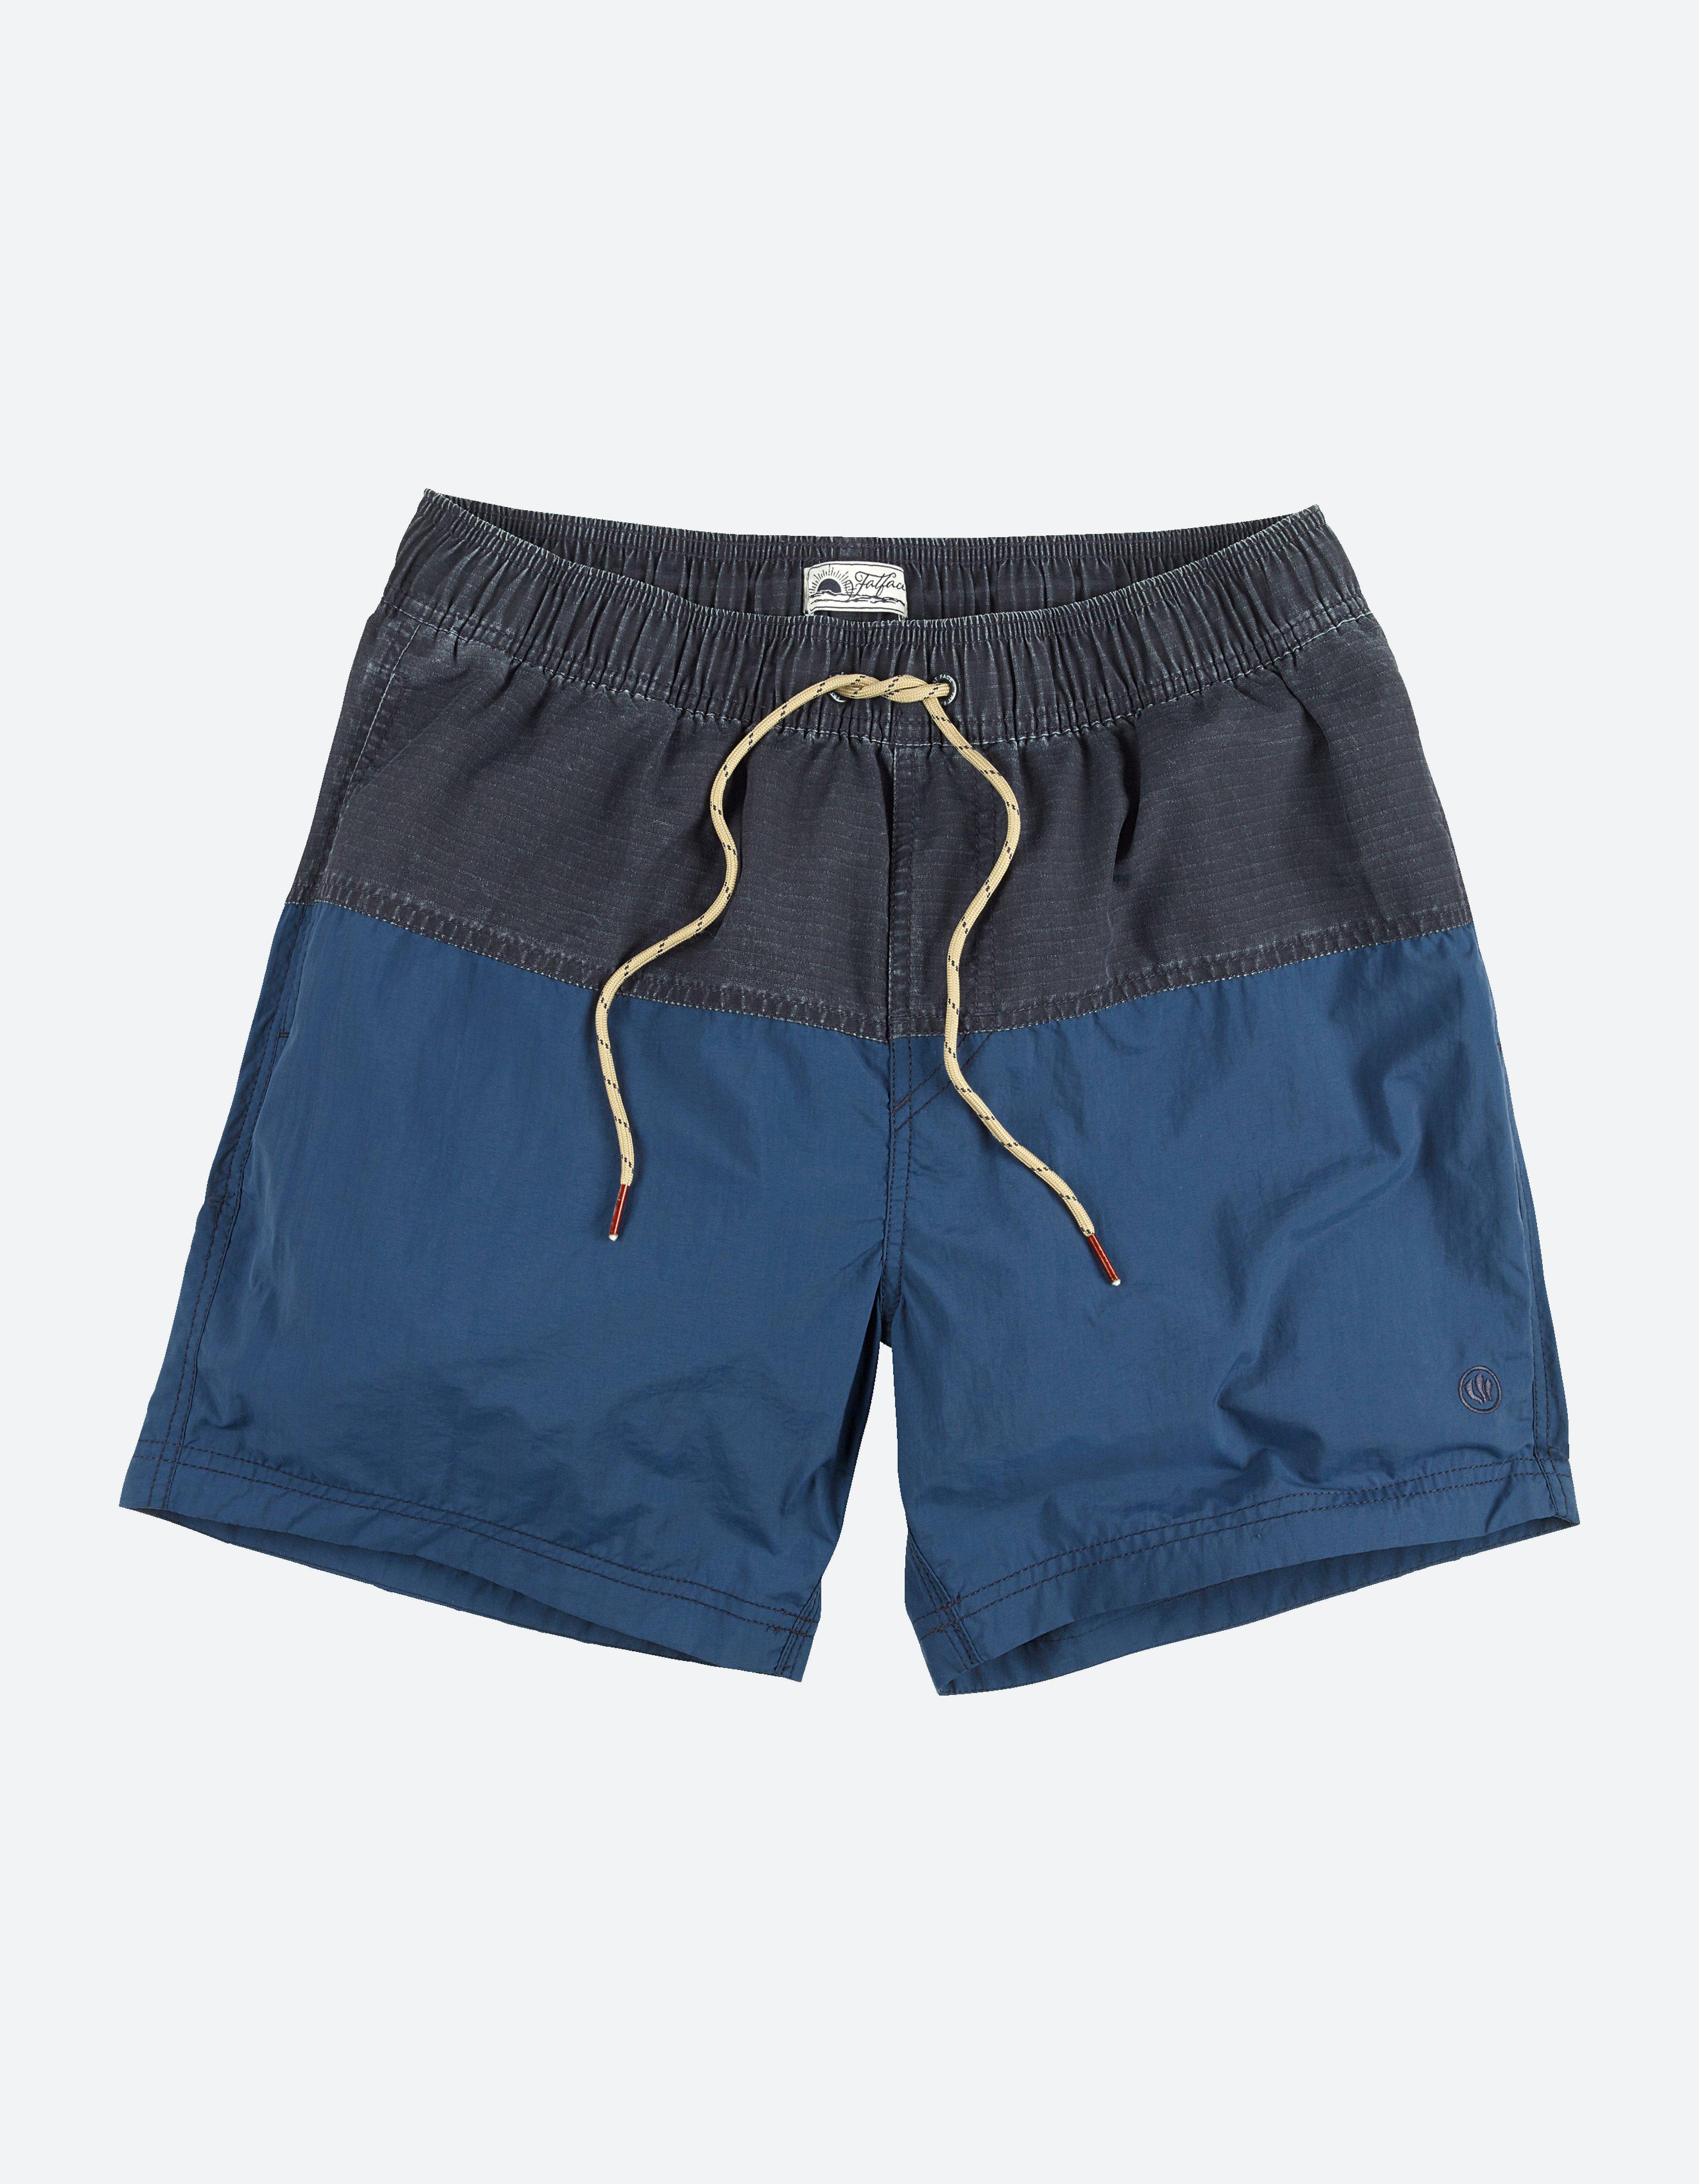 fat face sennen rip stop nylon swim shorts